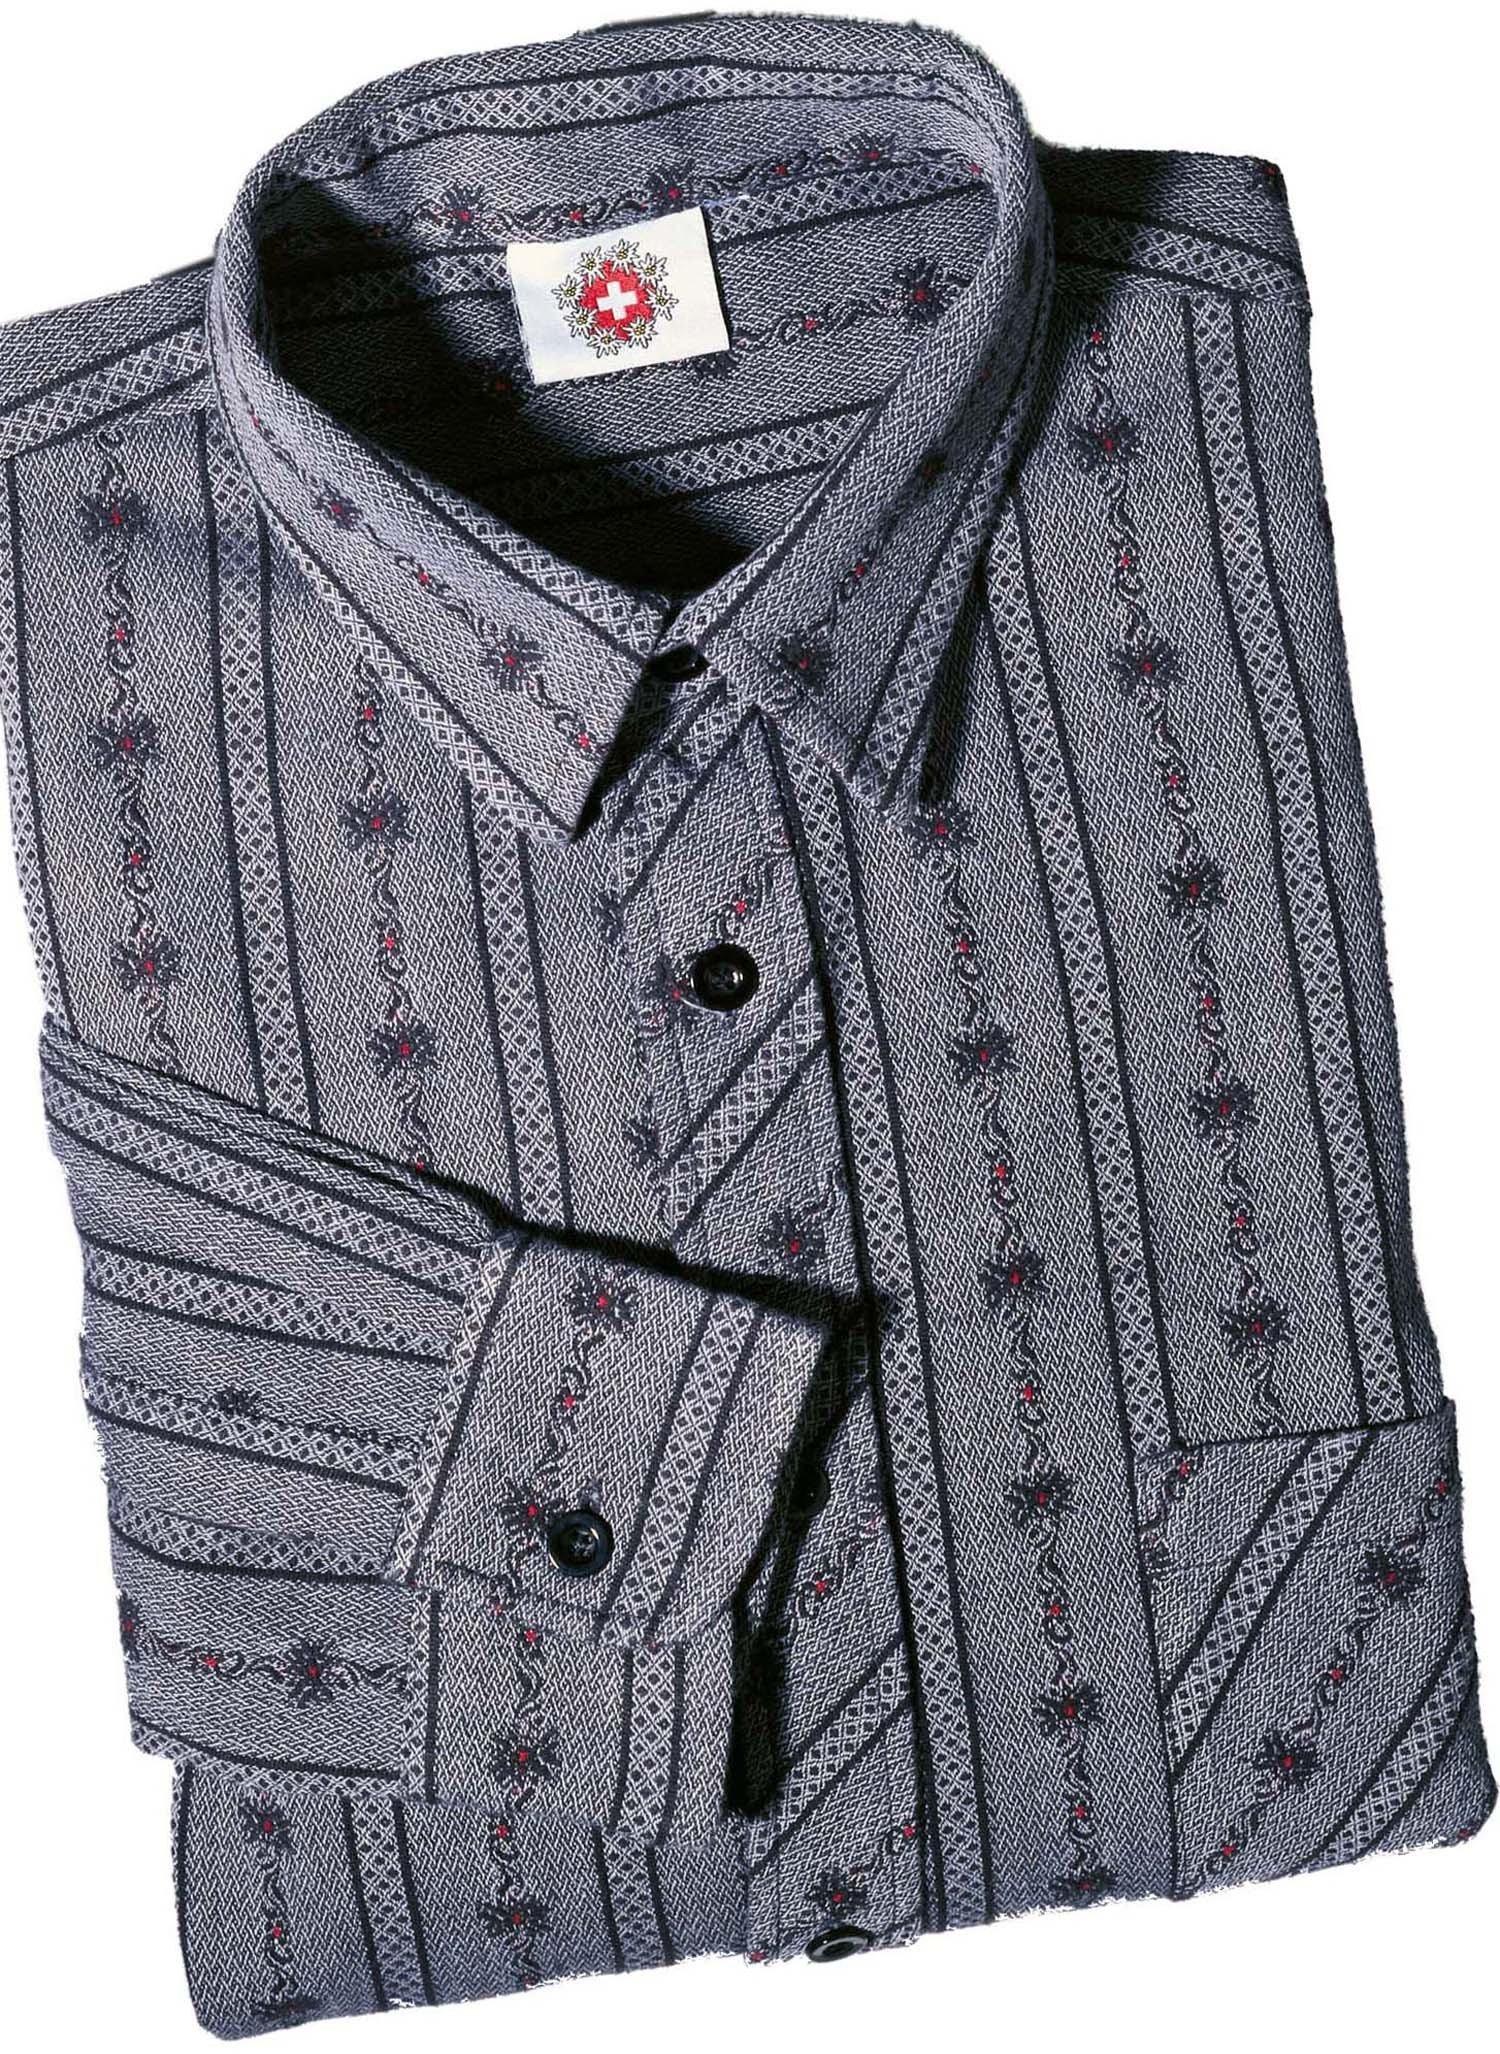 H-KA-Edelweiss Hemd, anthrazit 3738 013 - 2 - Ronja.ch